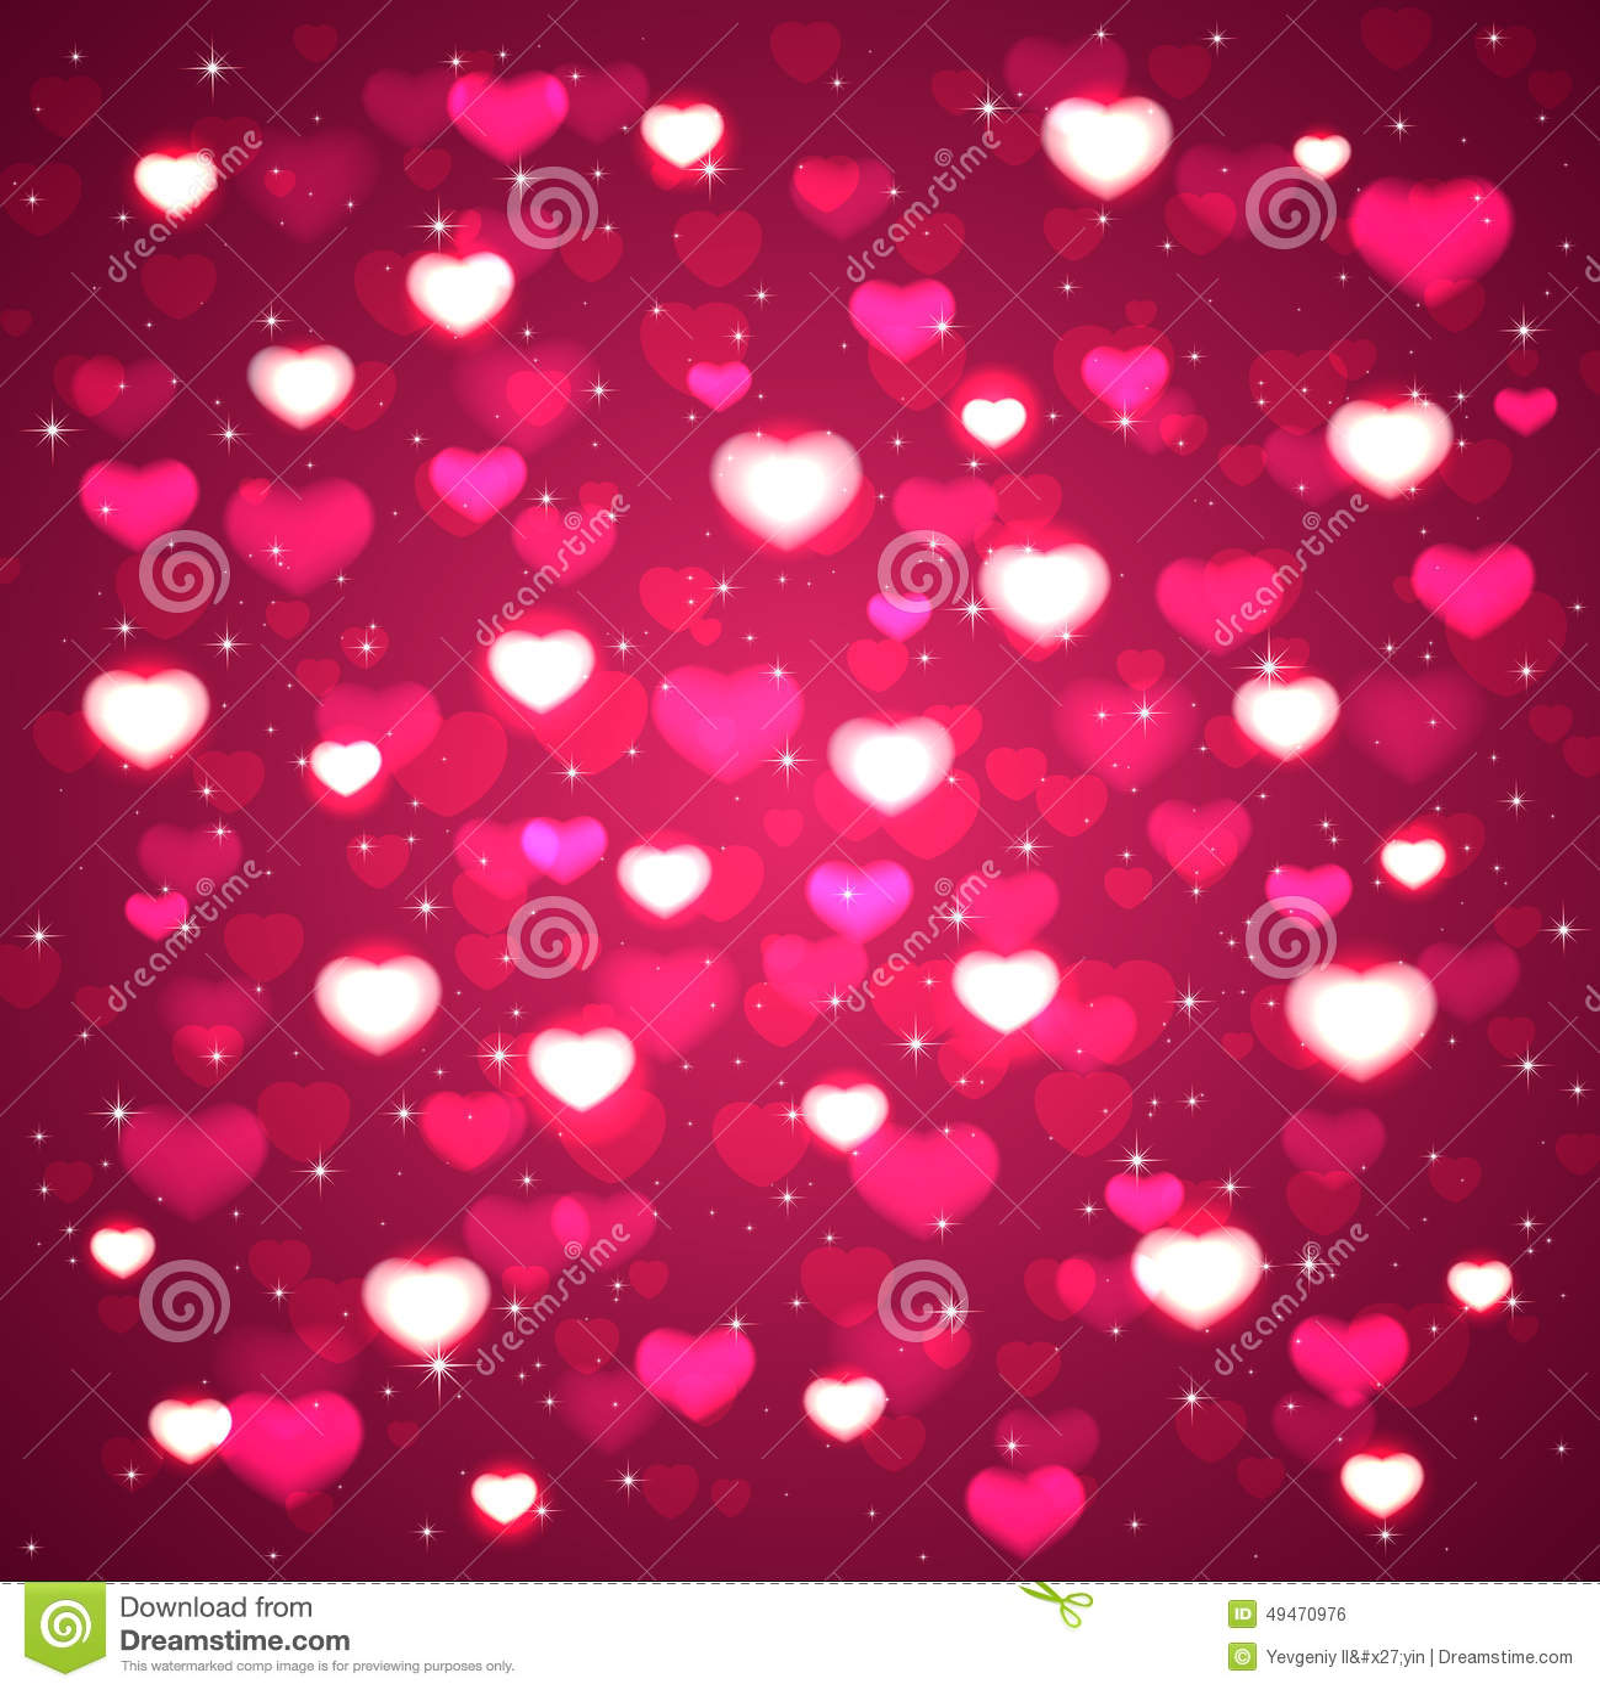 pink stars hearts wallpaper - photo #8